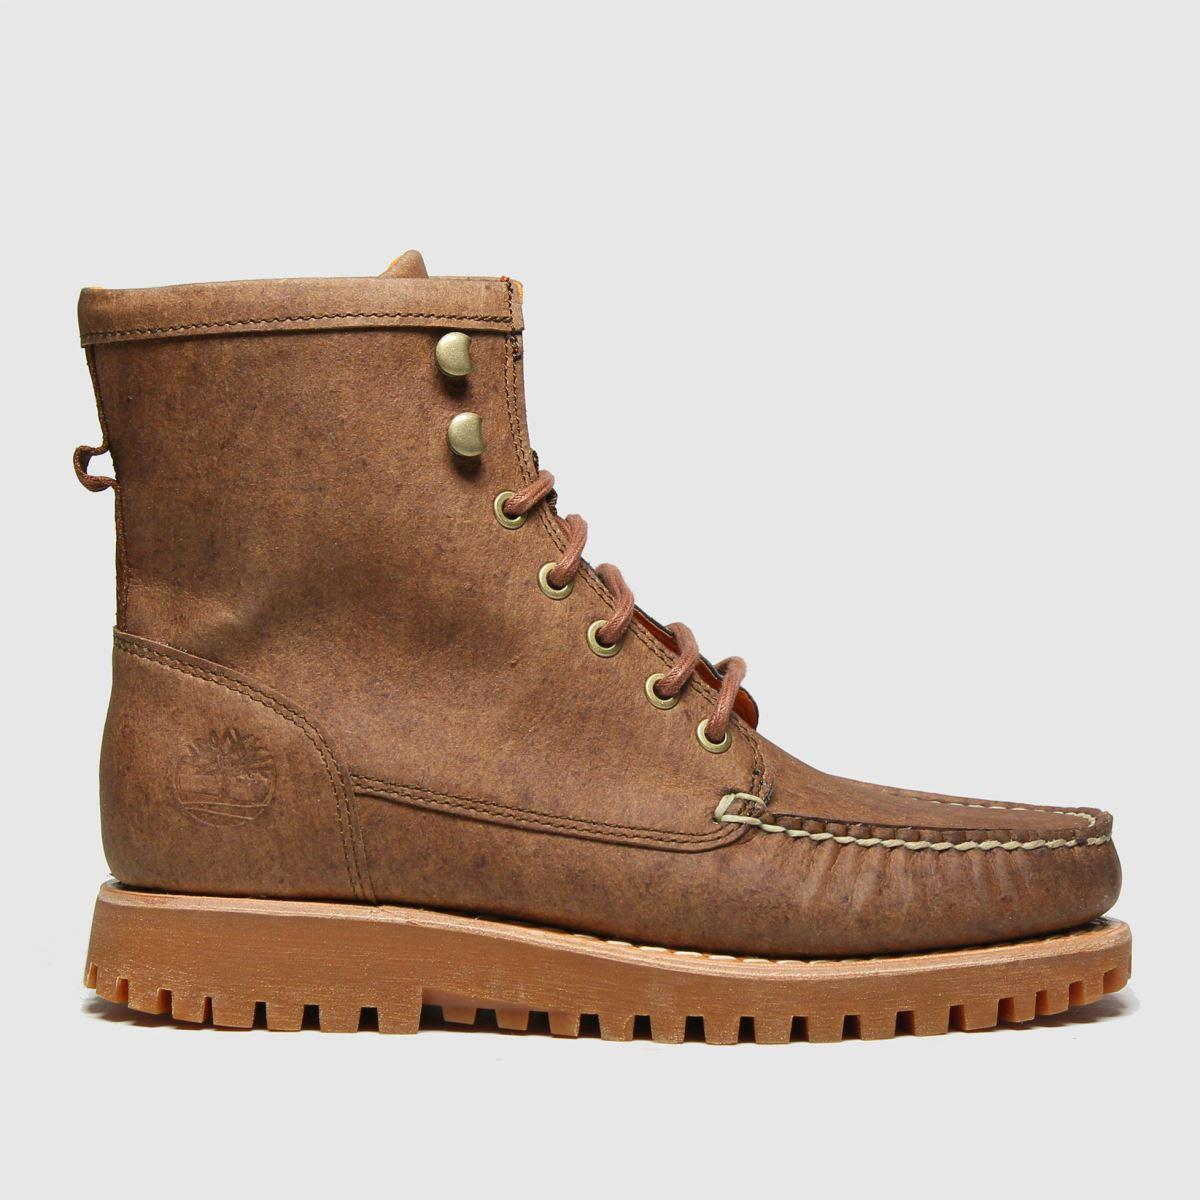 Timberland Tan Jacksons Landing Ek+ Boots